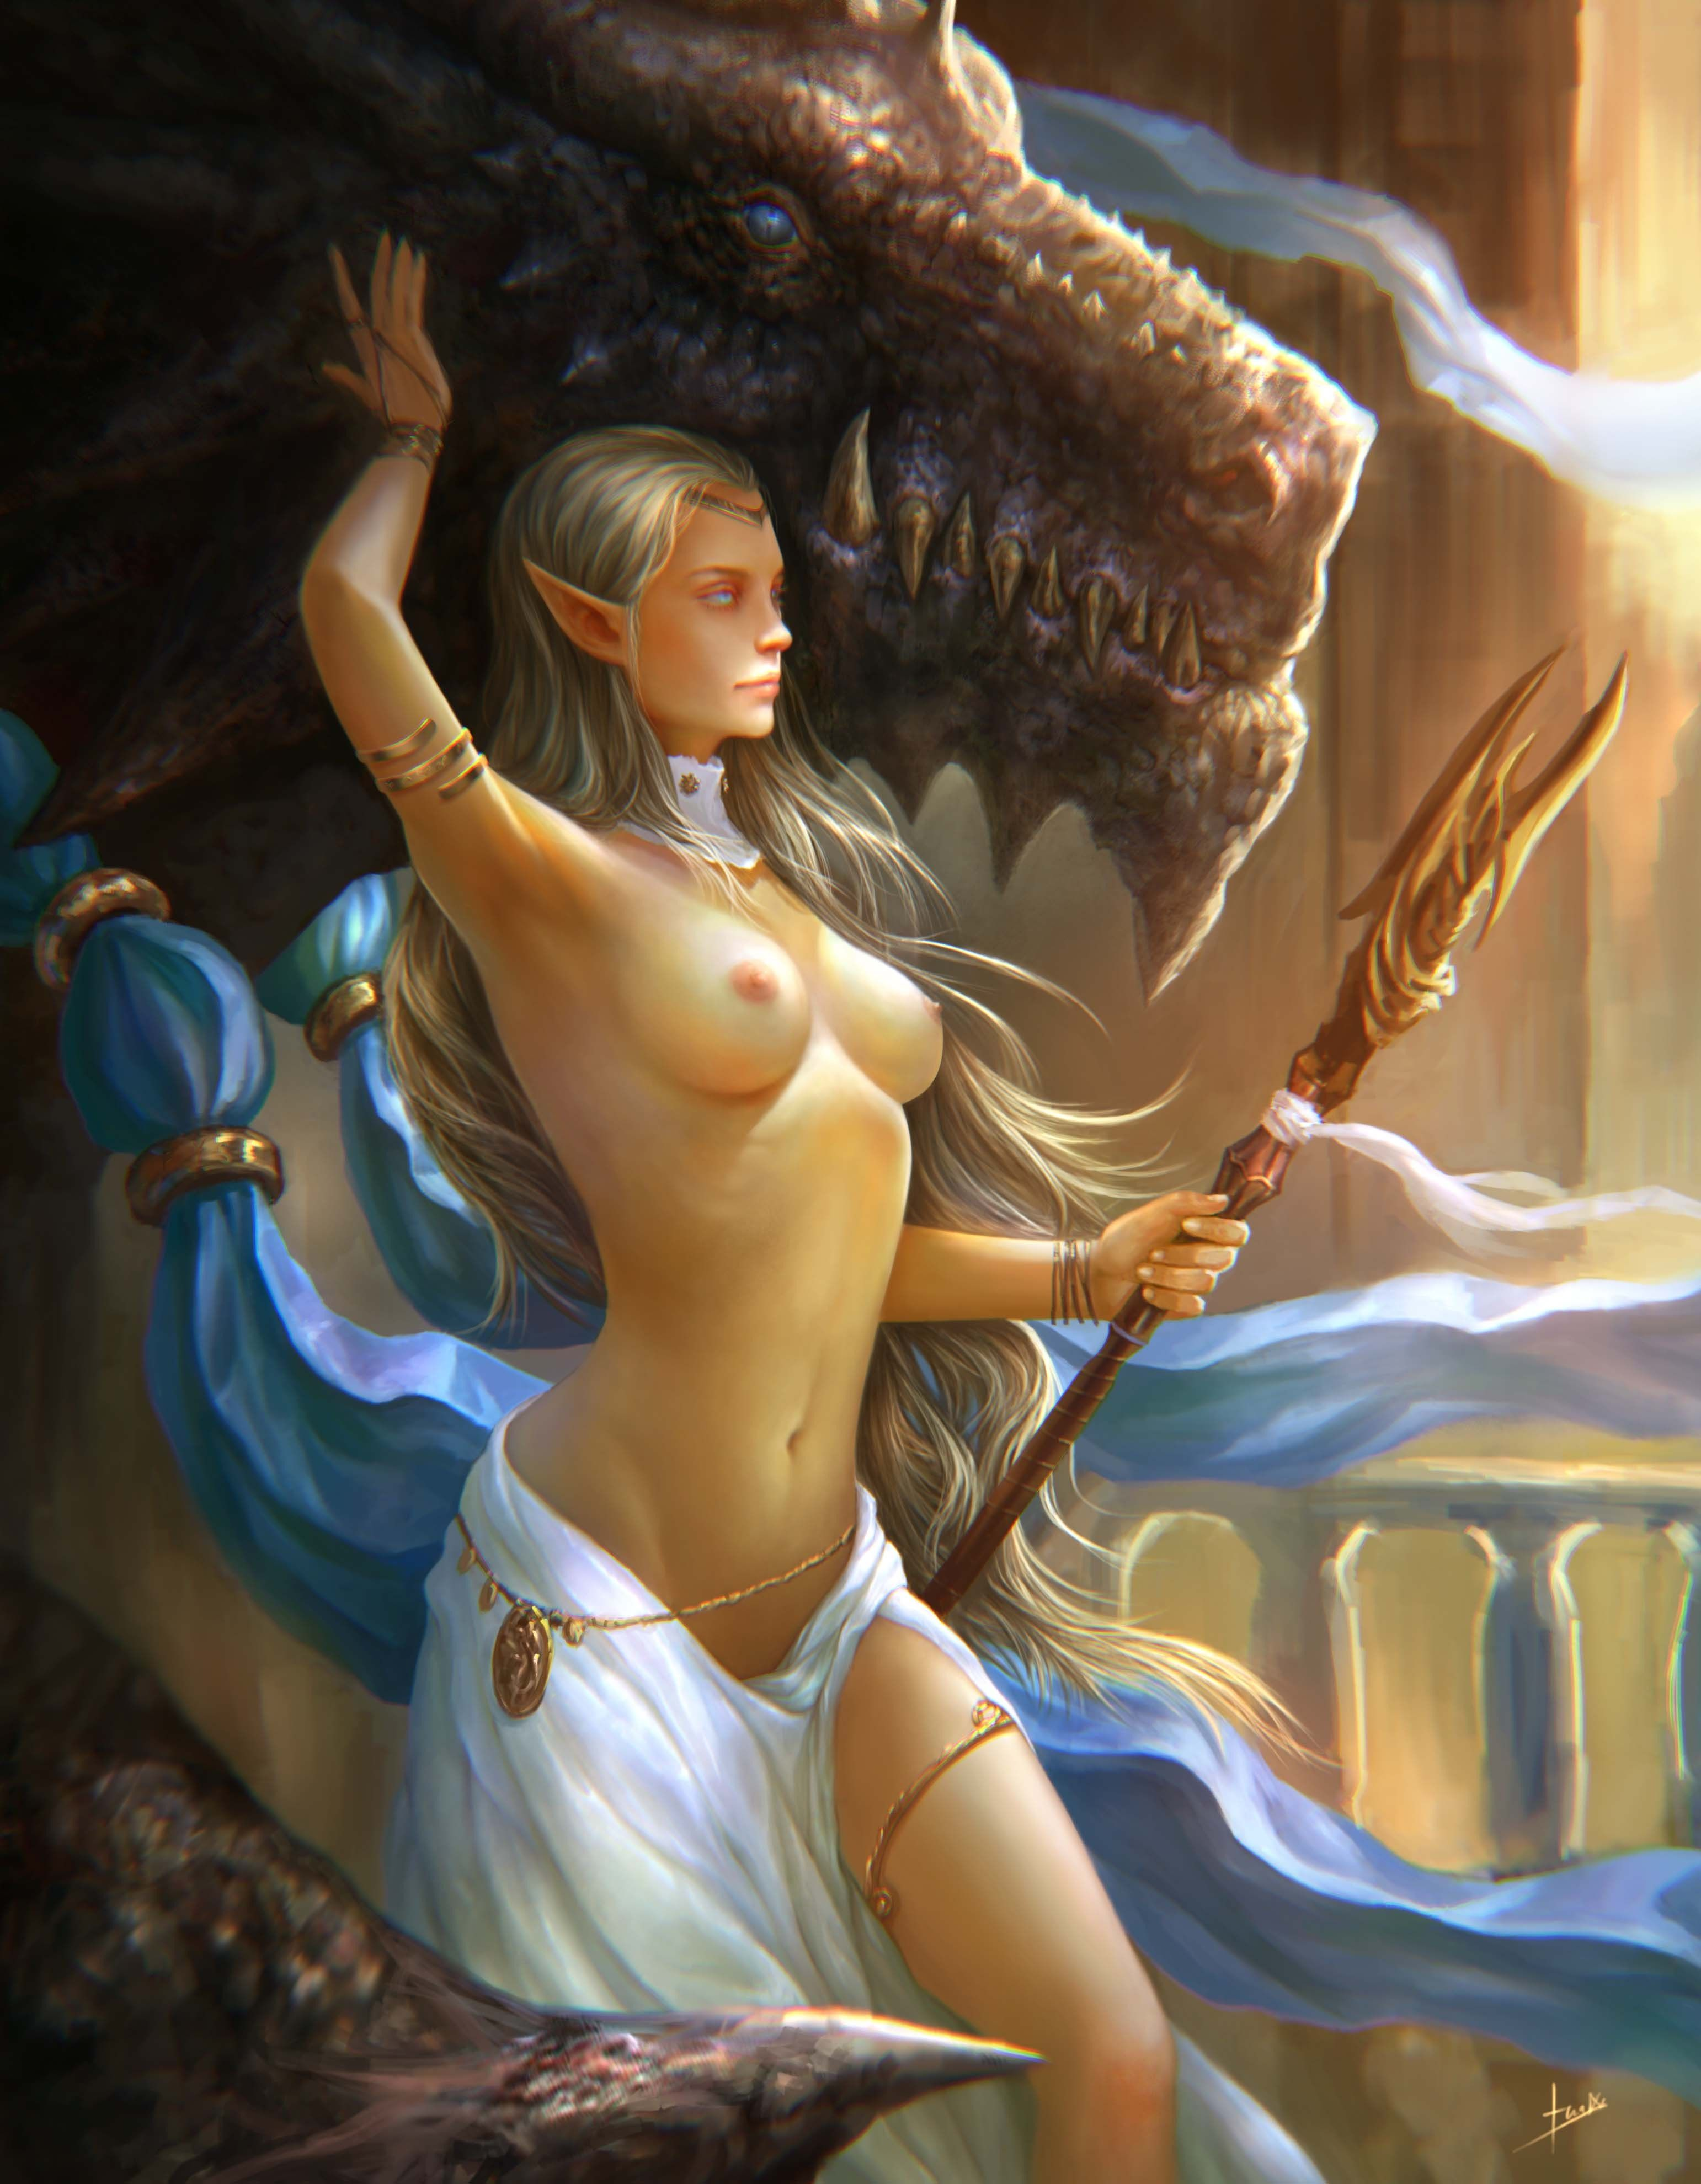 Sexy fantasy art and illustration